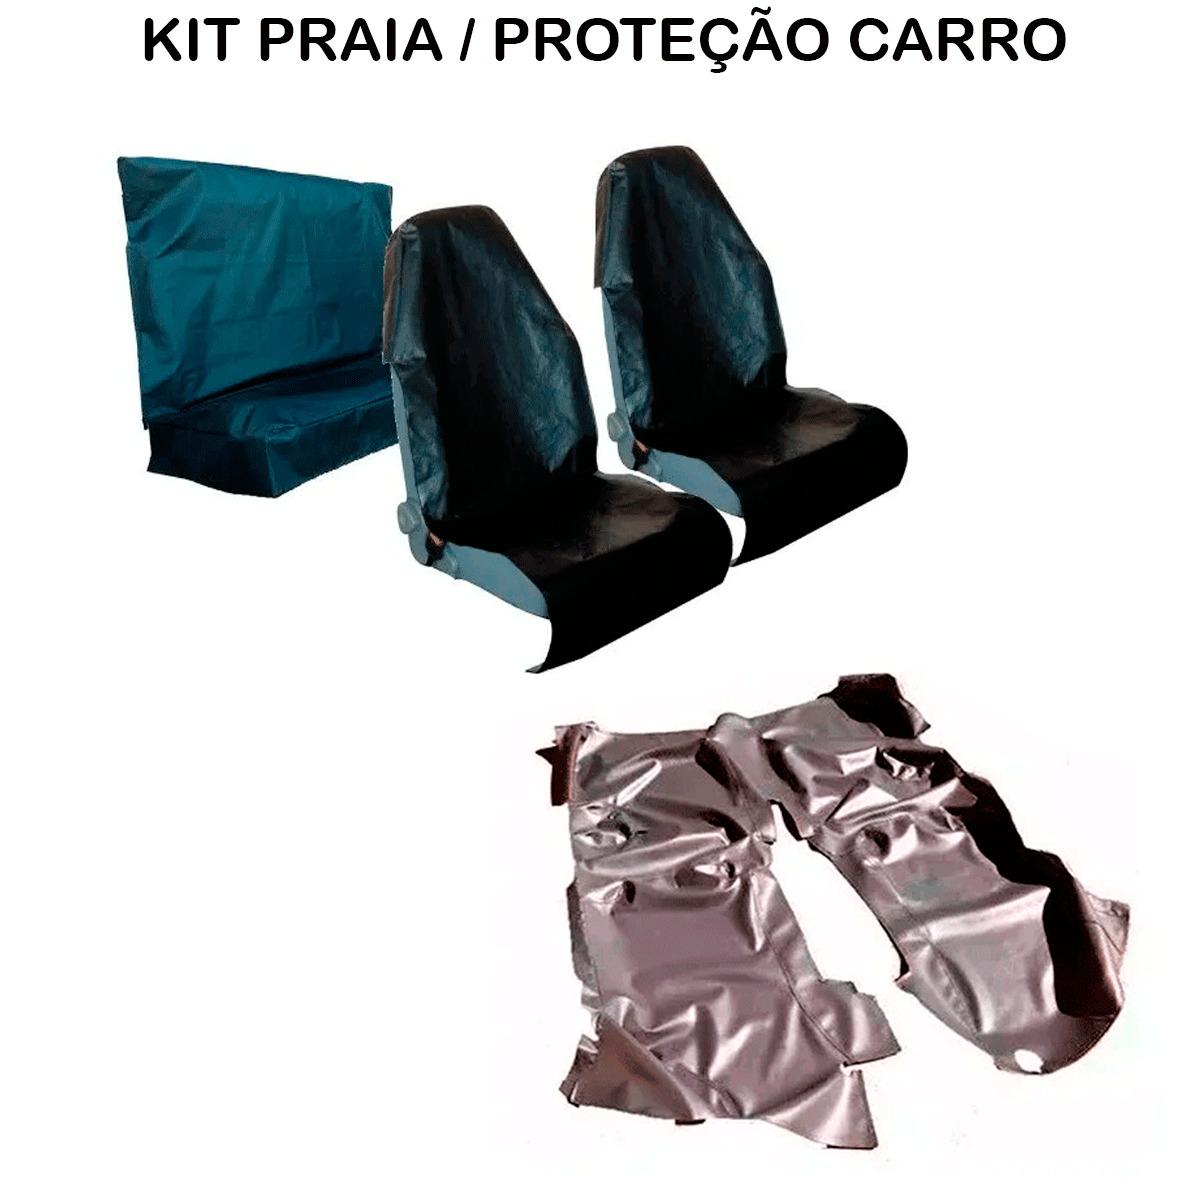 Tapete Em Vinil Volkswagen Parati Quadrada + Capa Banco Protecao Banco Areia Suor Academia